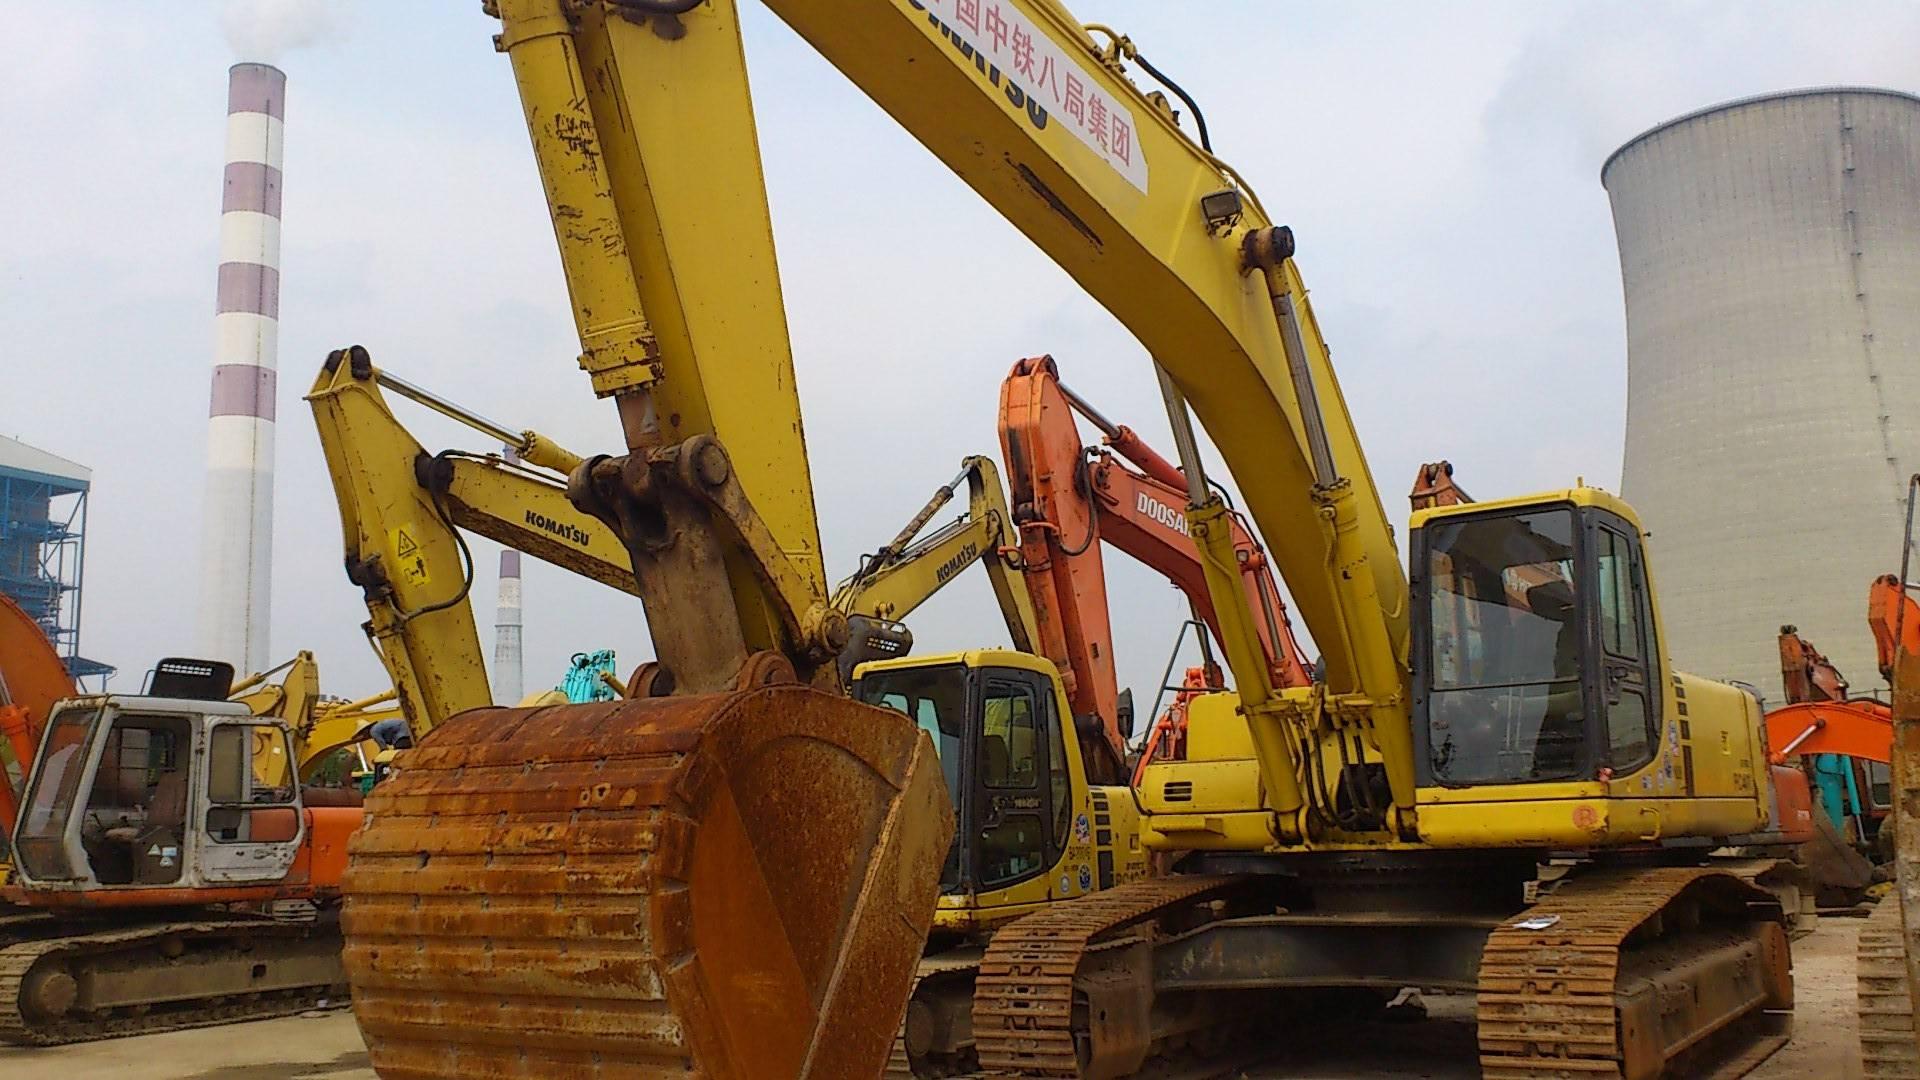 PC400-6 komatsu used excavator for sale